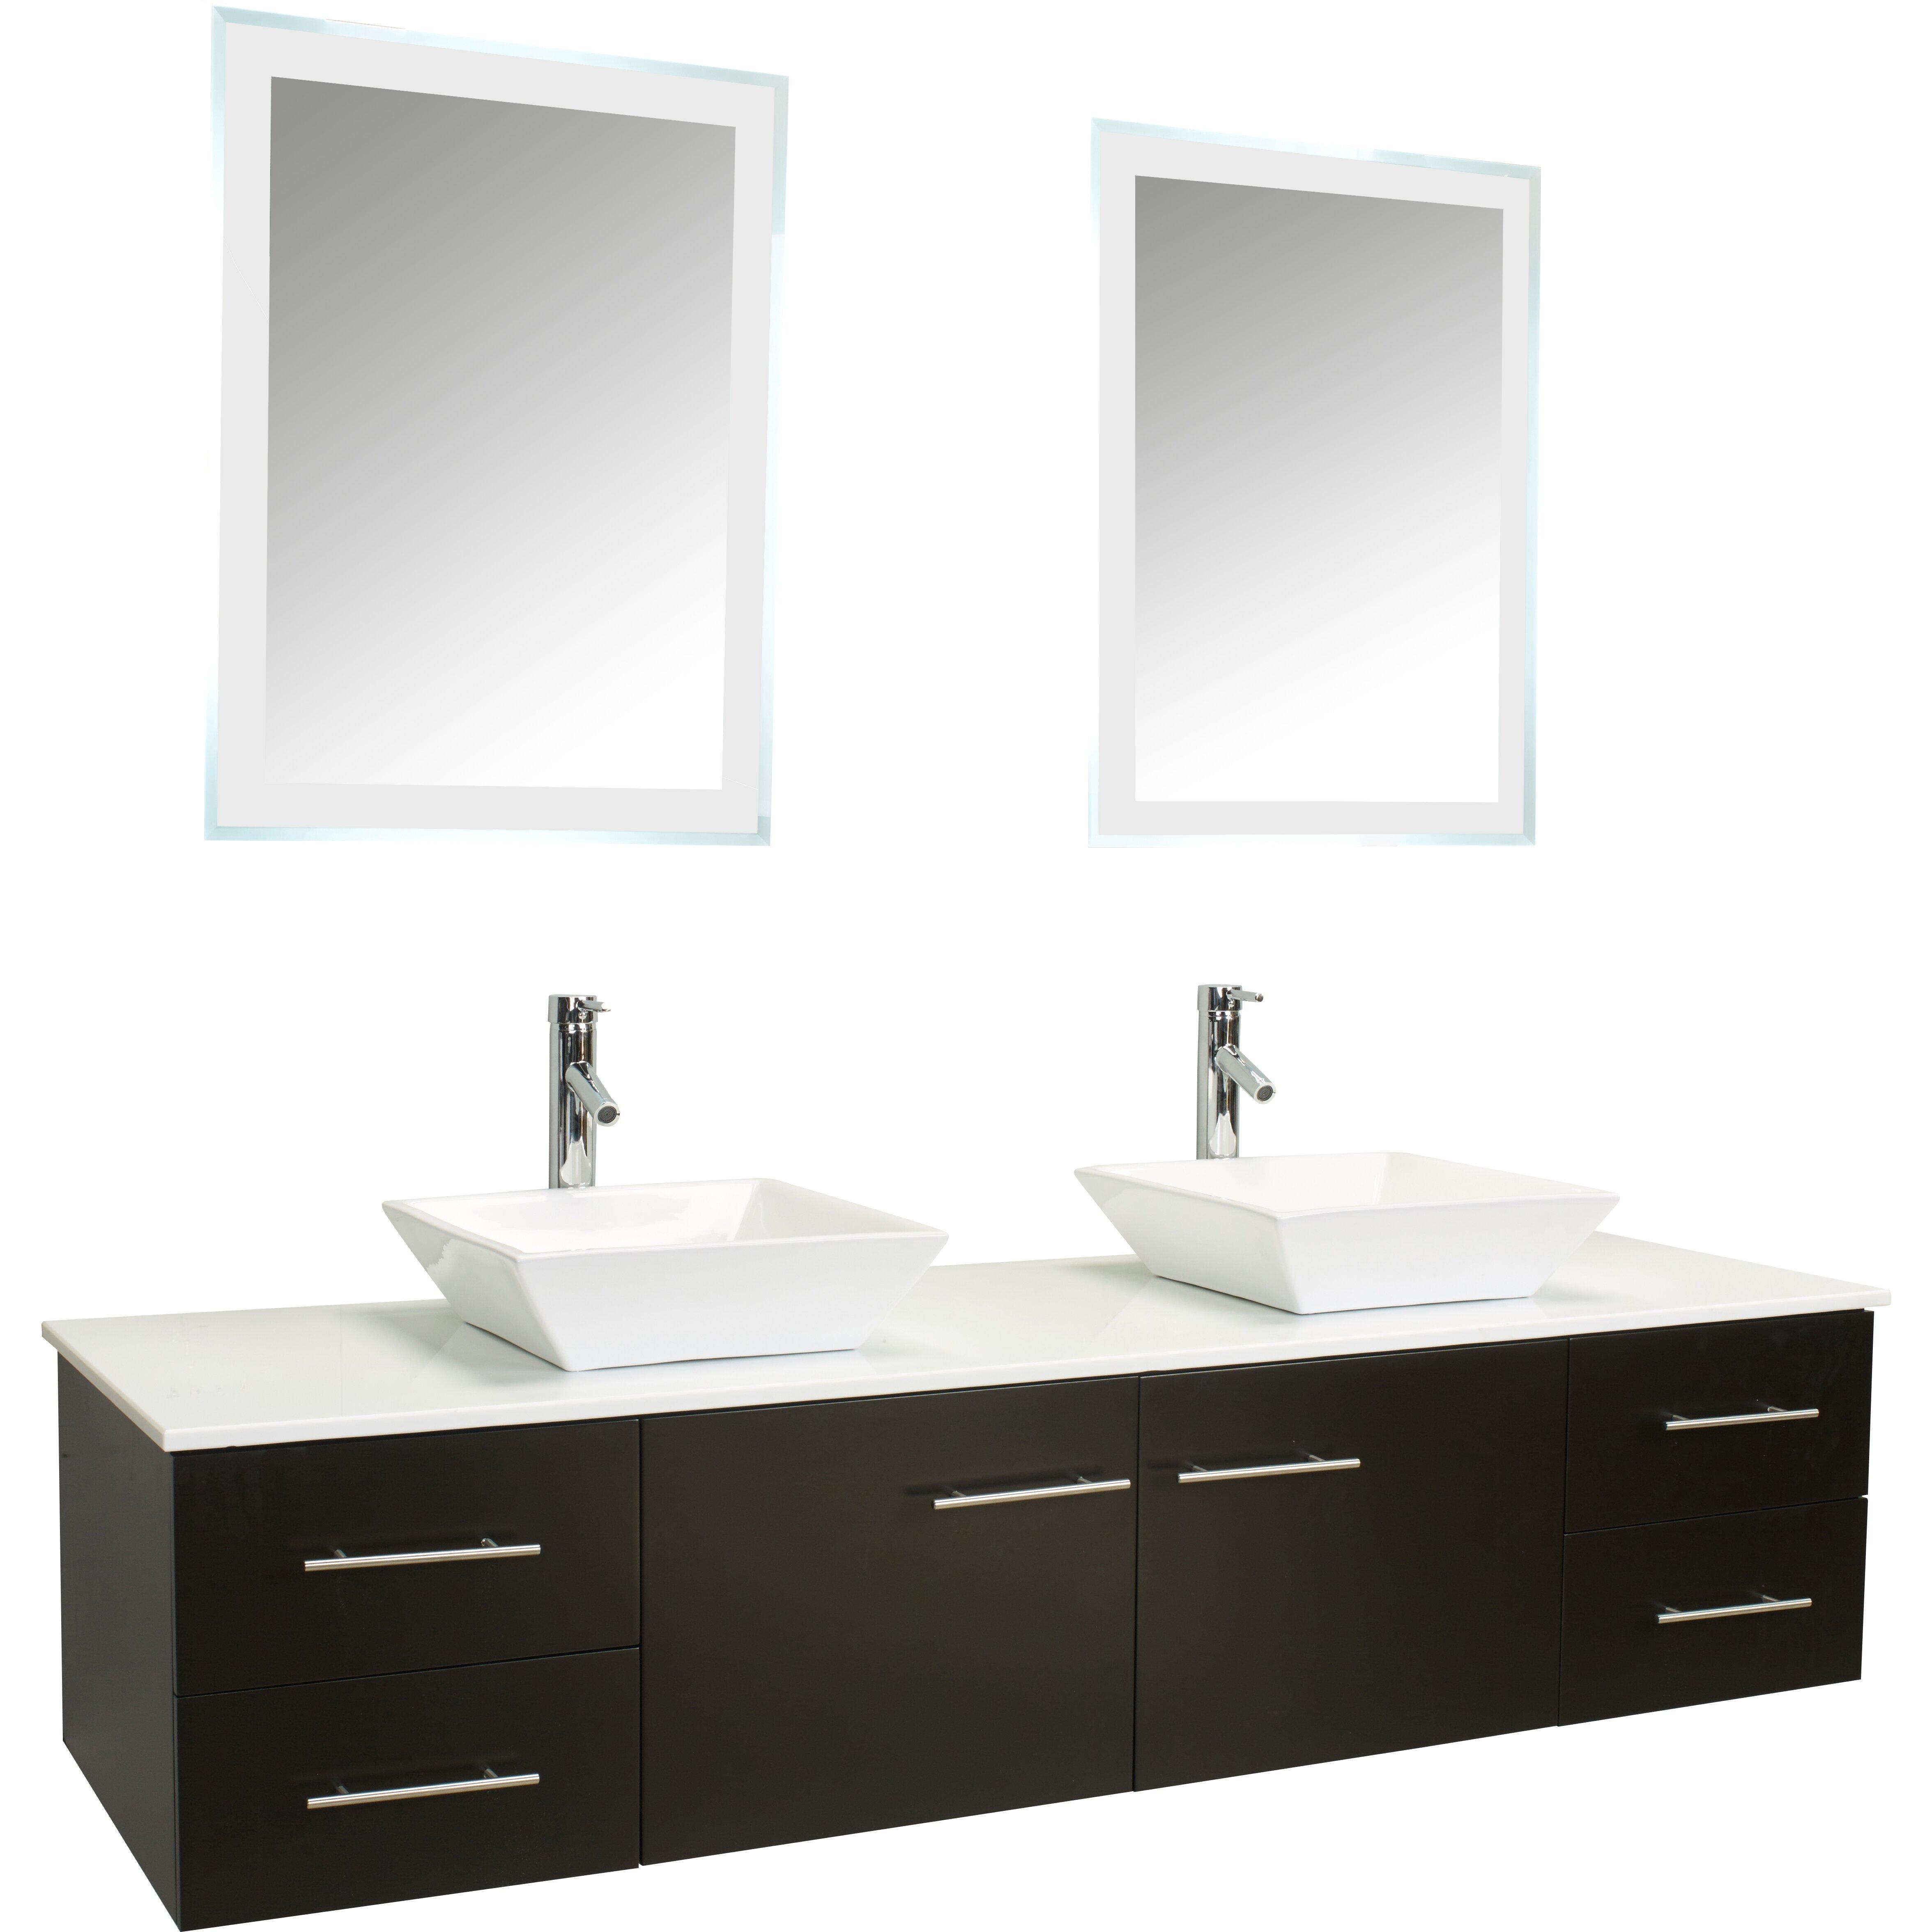 Eviva totti wave 60 double sink espresso modern bathroom for Modern bathroom sets